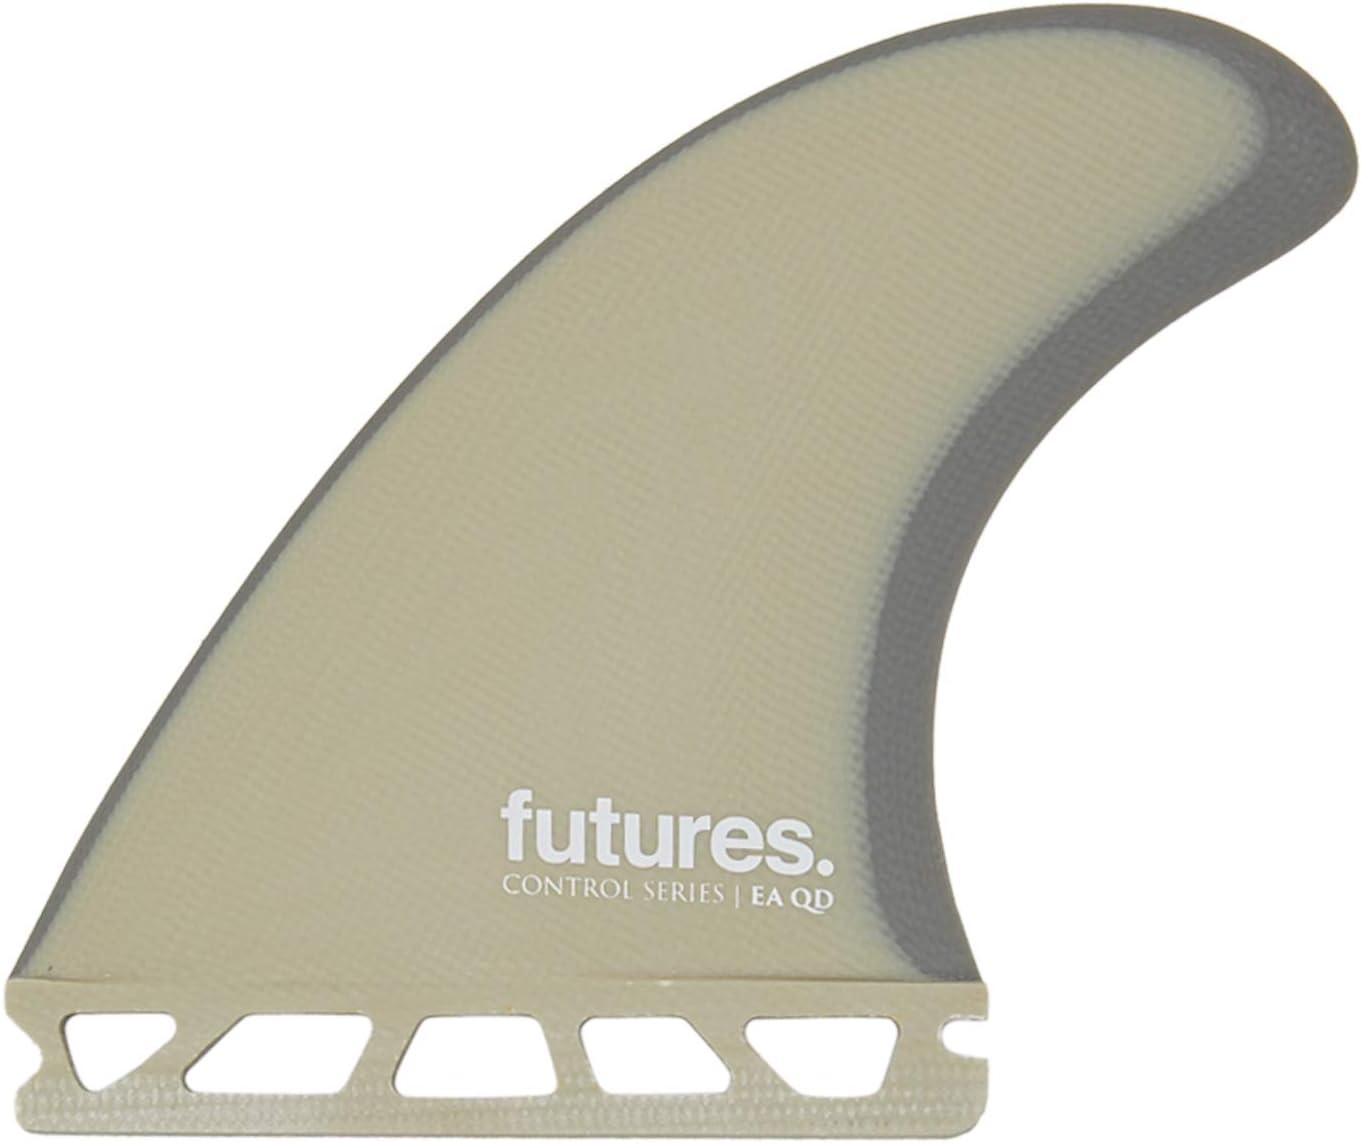 Futures Topics on TV FEA Quad Series Daily bargain sale Control Fin